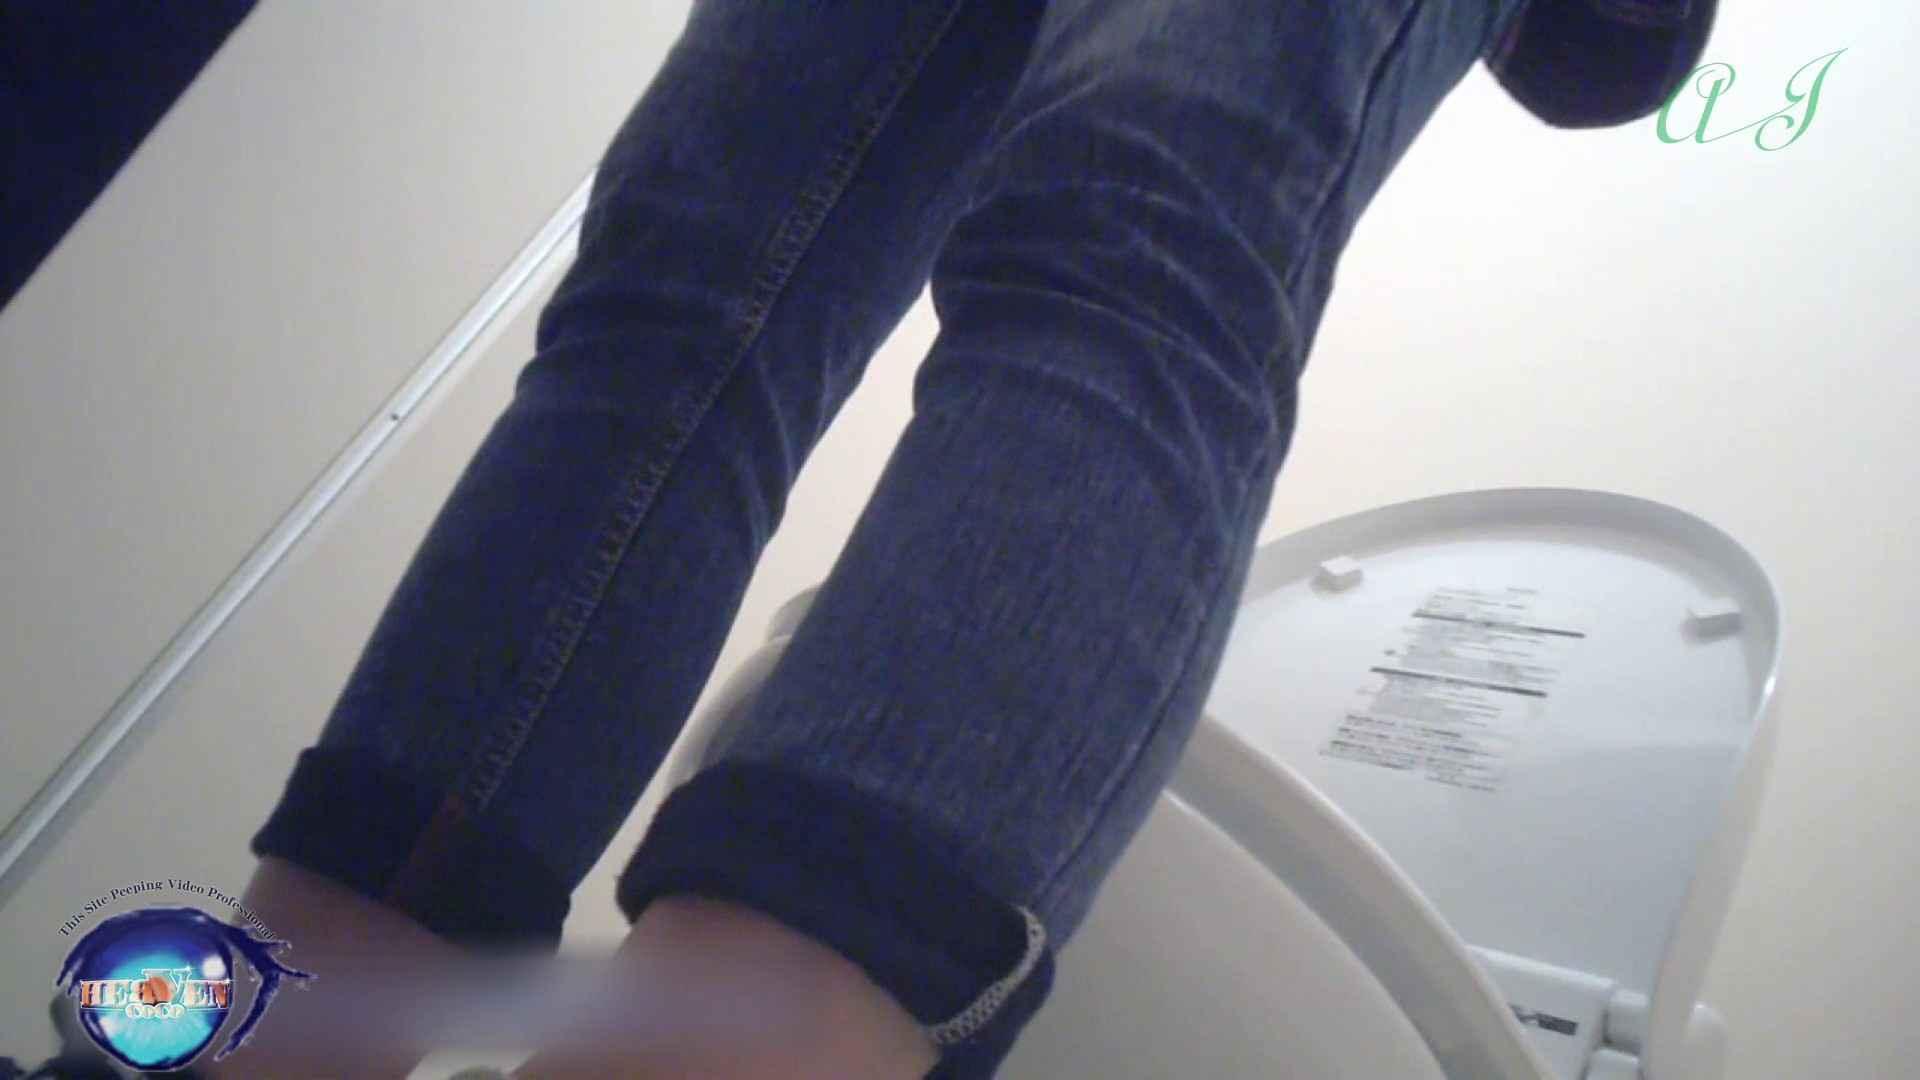 有名大学女性洗面所 vol.71 美女学生さんの潜入盗撮!後編 潜入 ヌード画像 102PIX 56